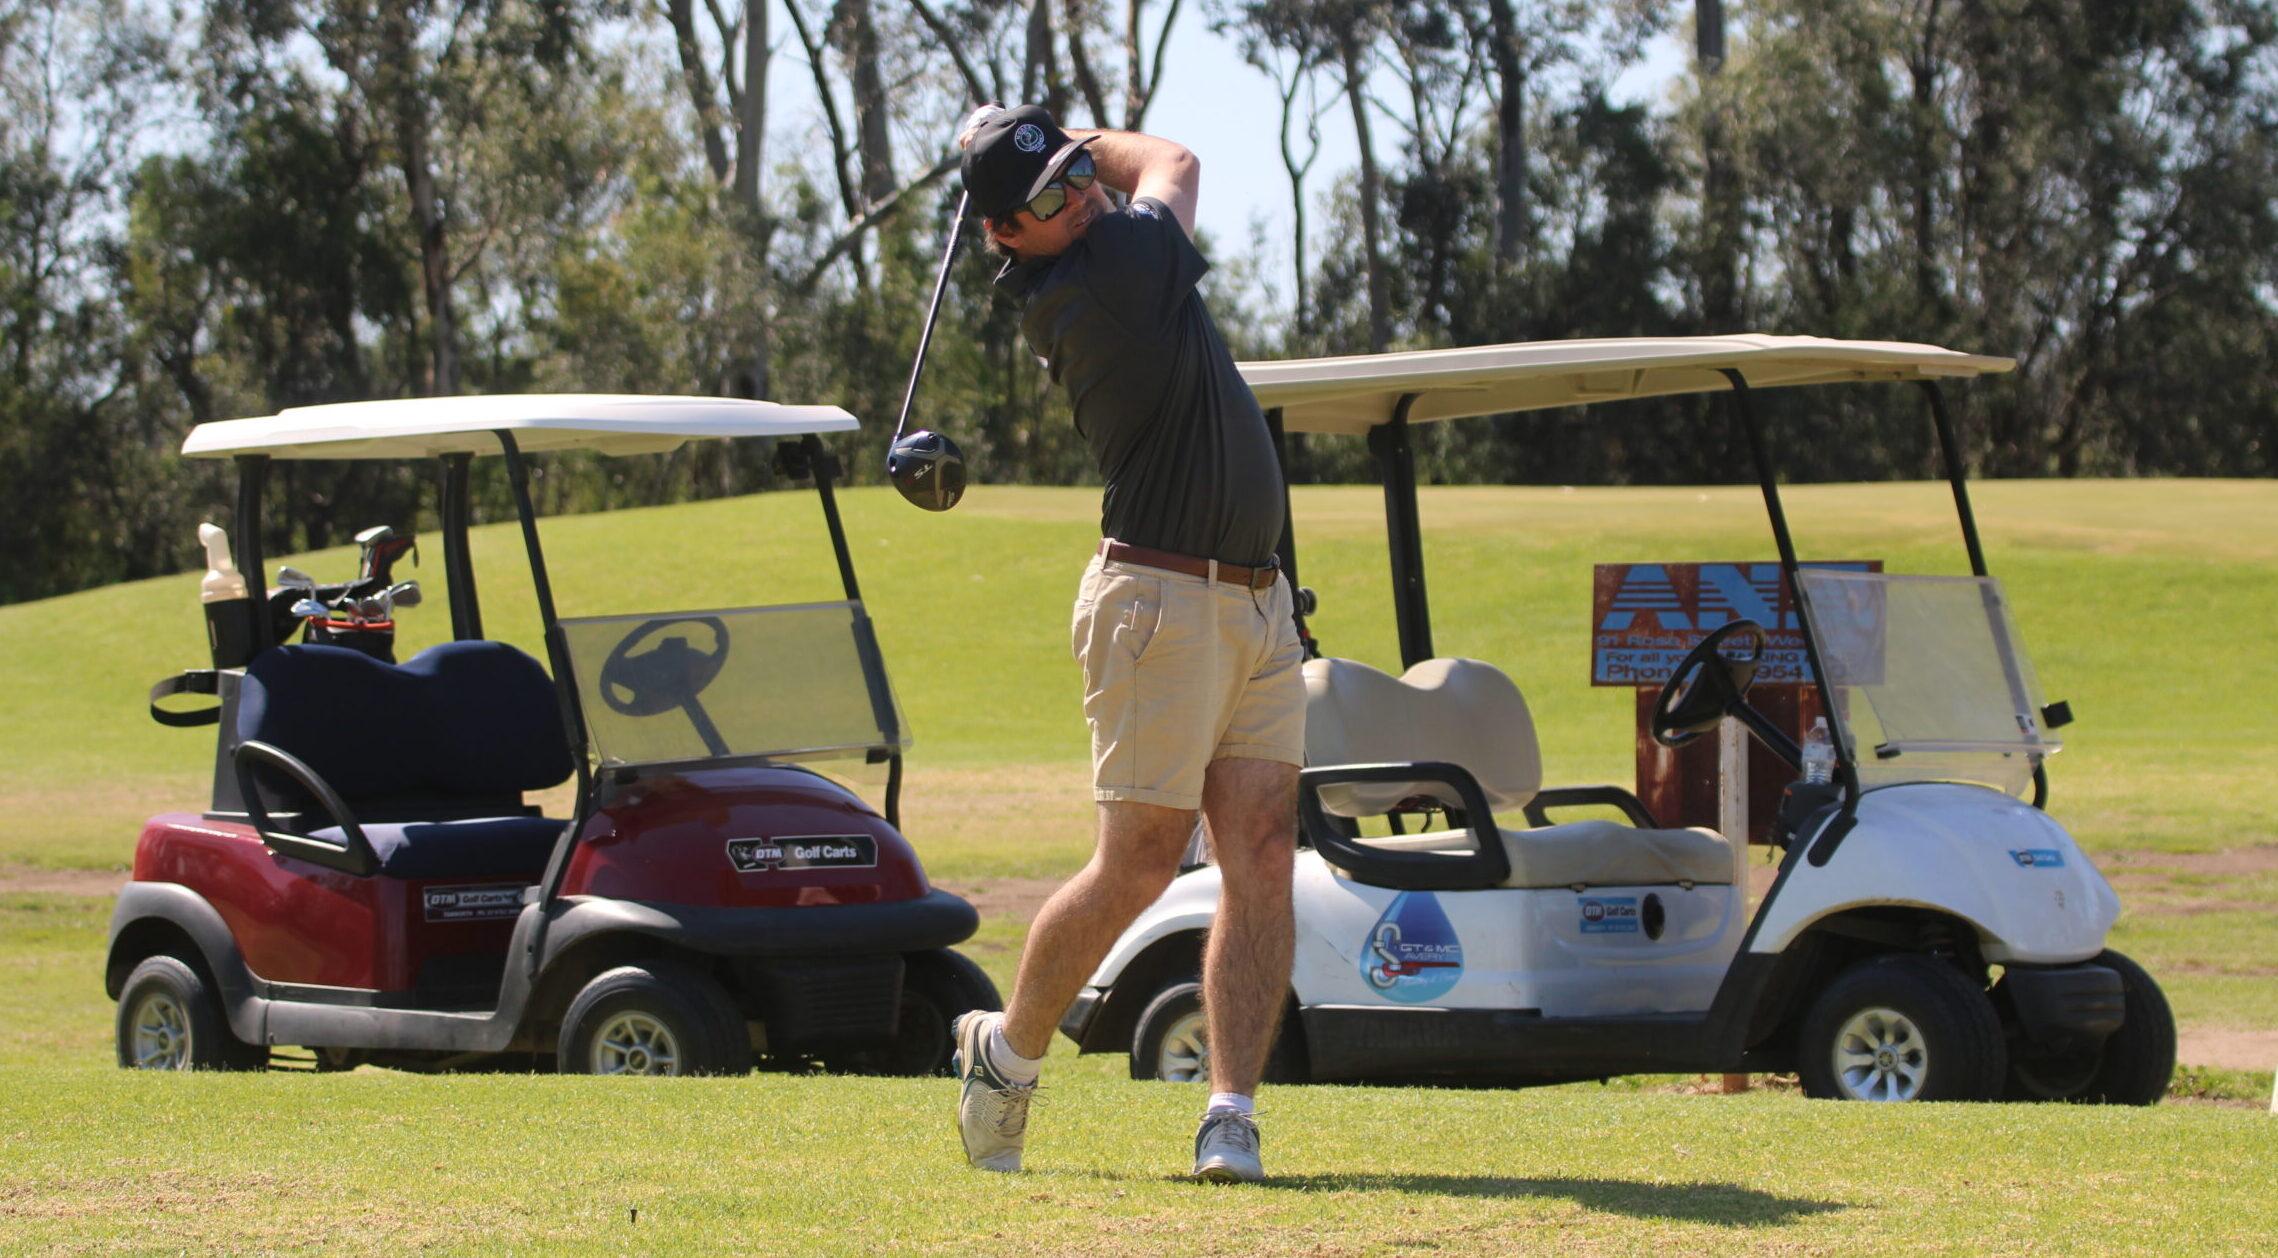 David Avery crowned Wee Waa Golf Club's 2021 club champion